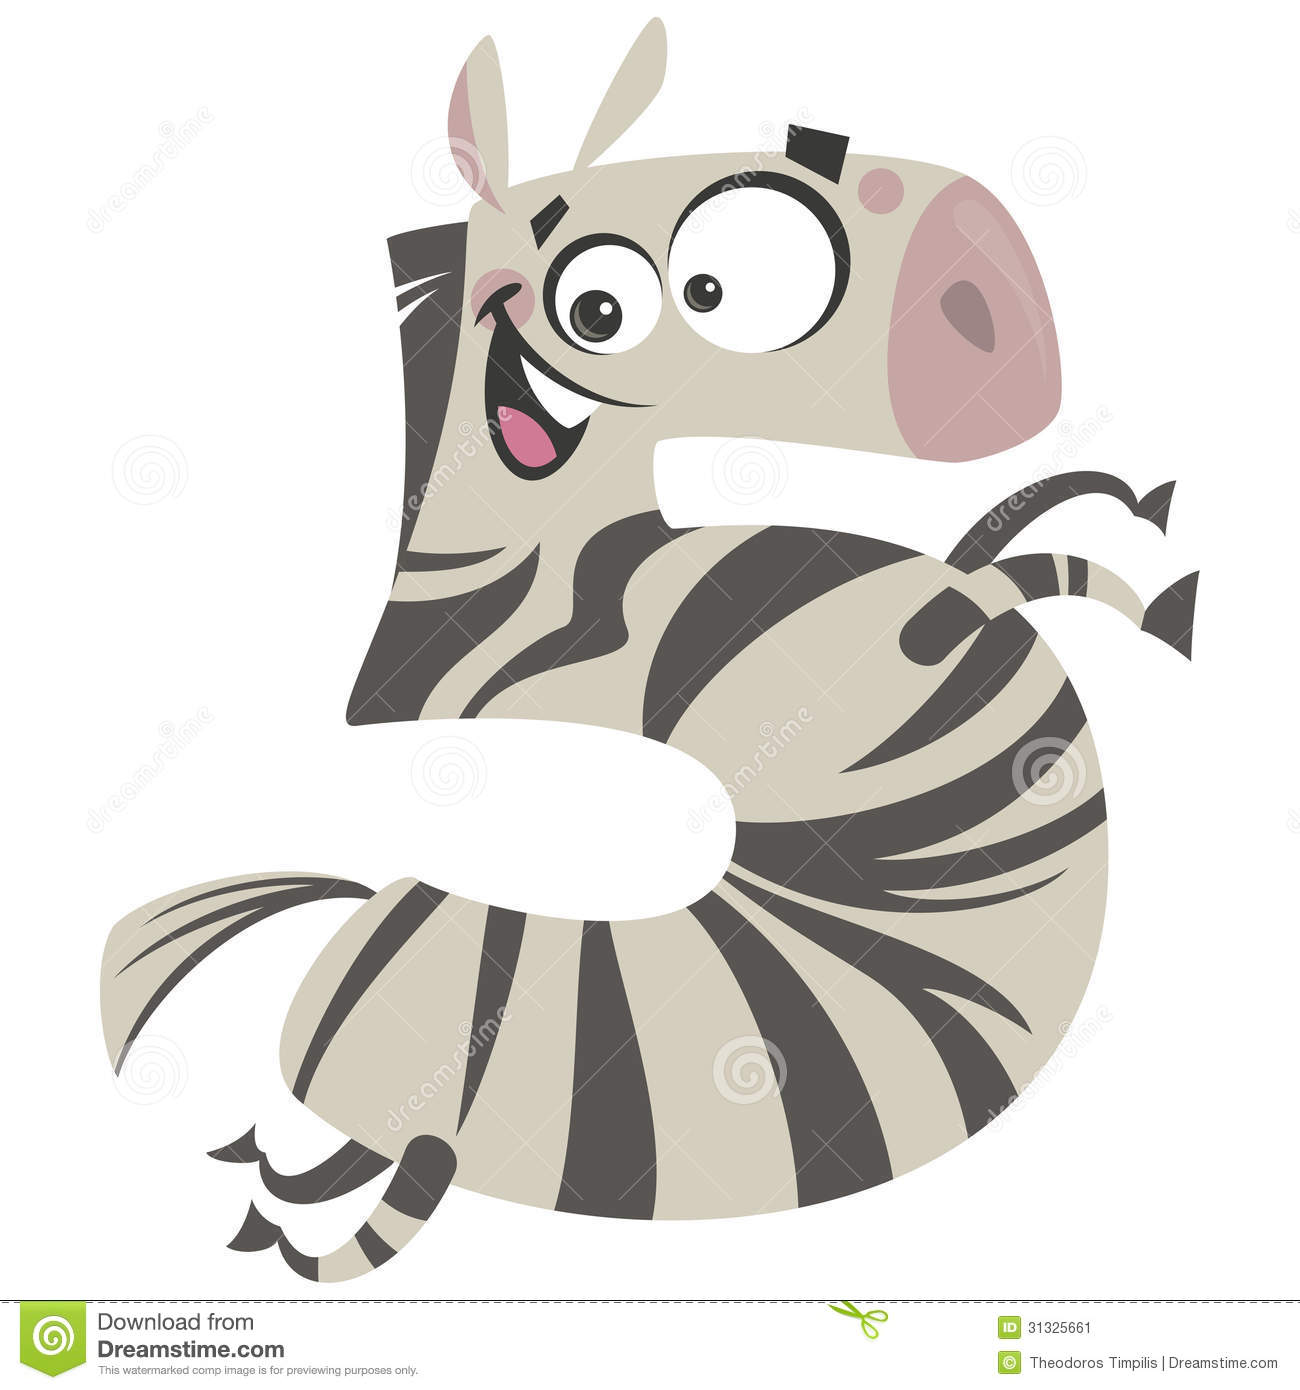 Zebra clipart number 1 #1 Zebra Clipart 5 Zebra